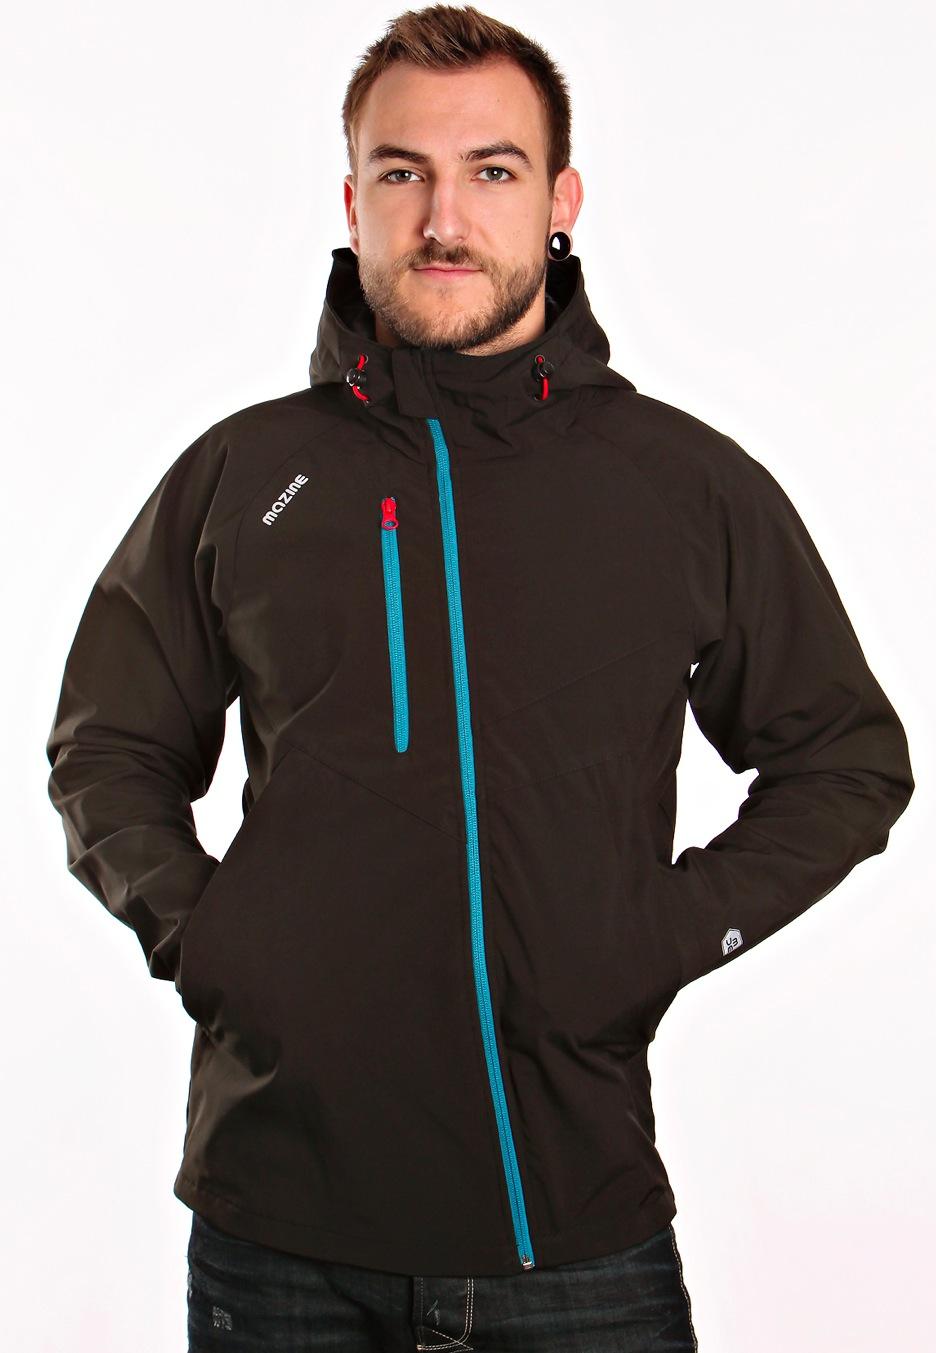 024fc7b1a6c8 Mazine - Steely Light Black - Jacket - Streetwear Shop - Impericon ...